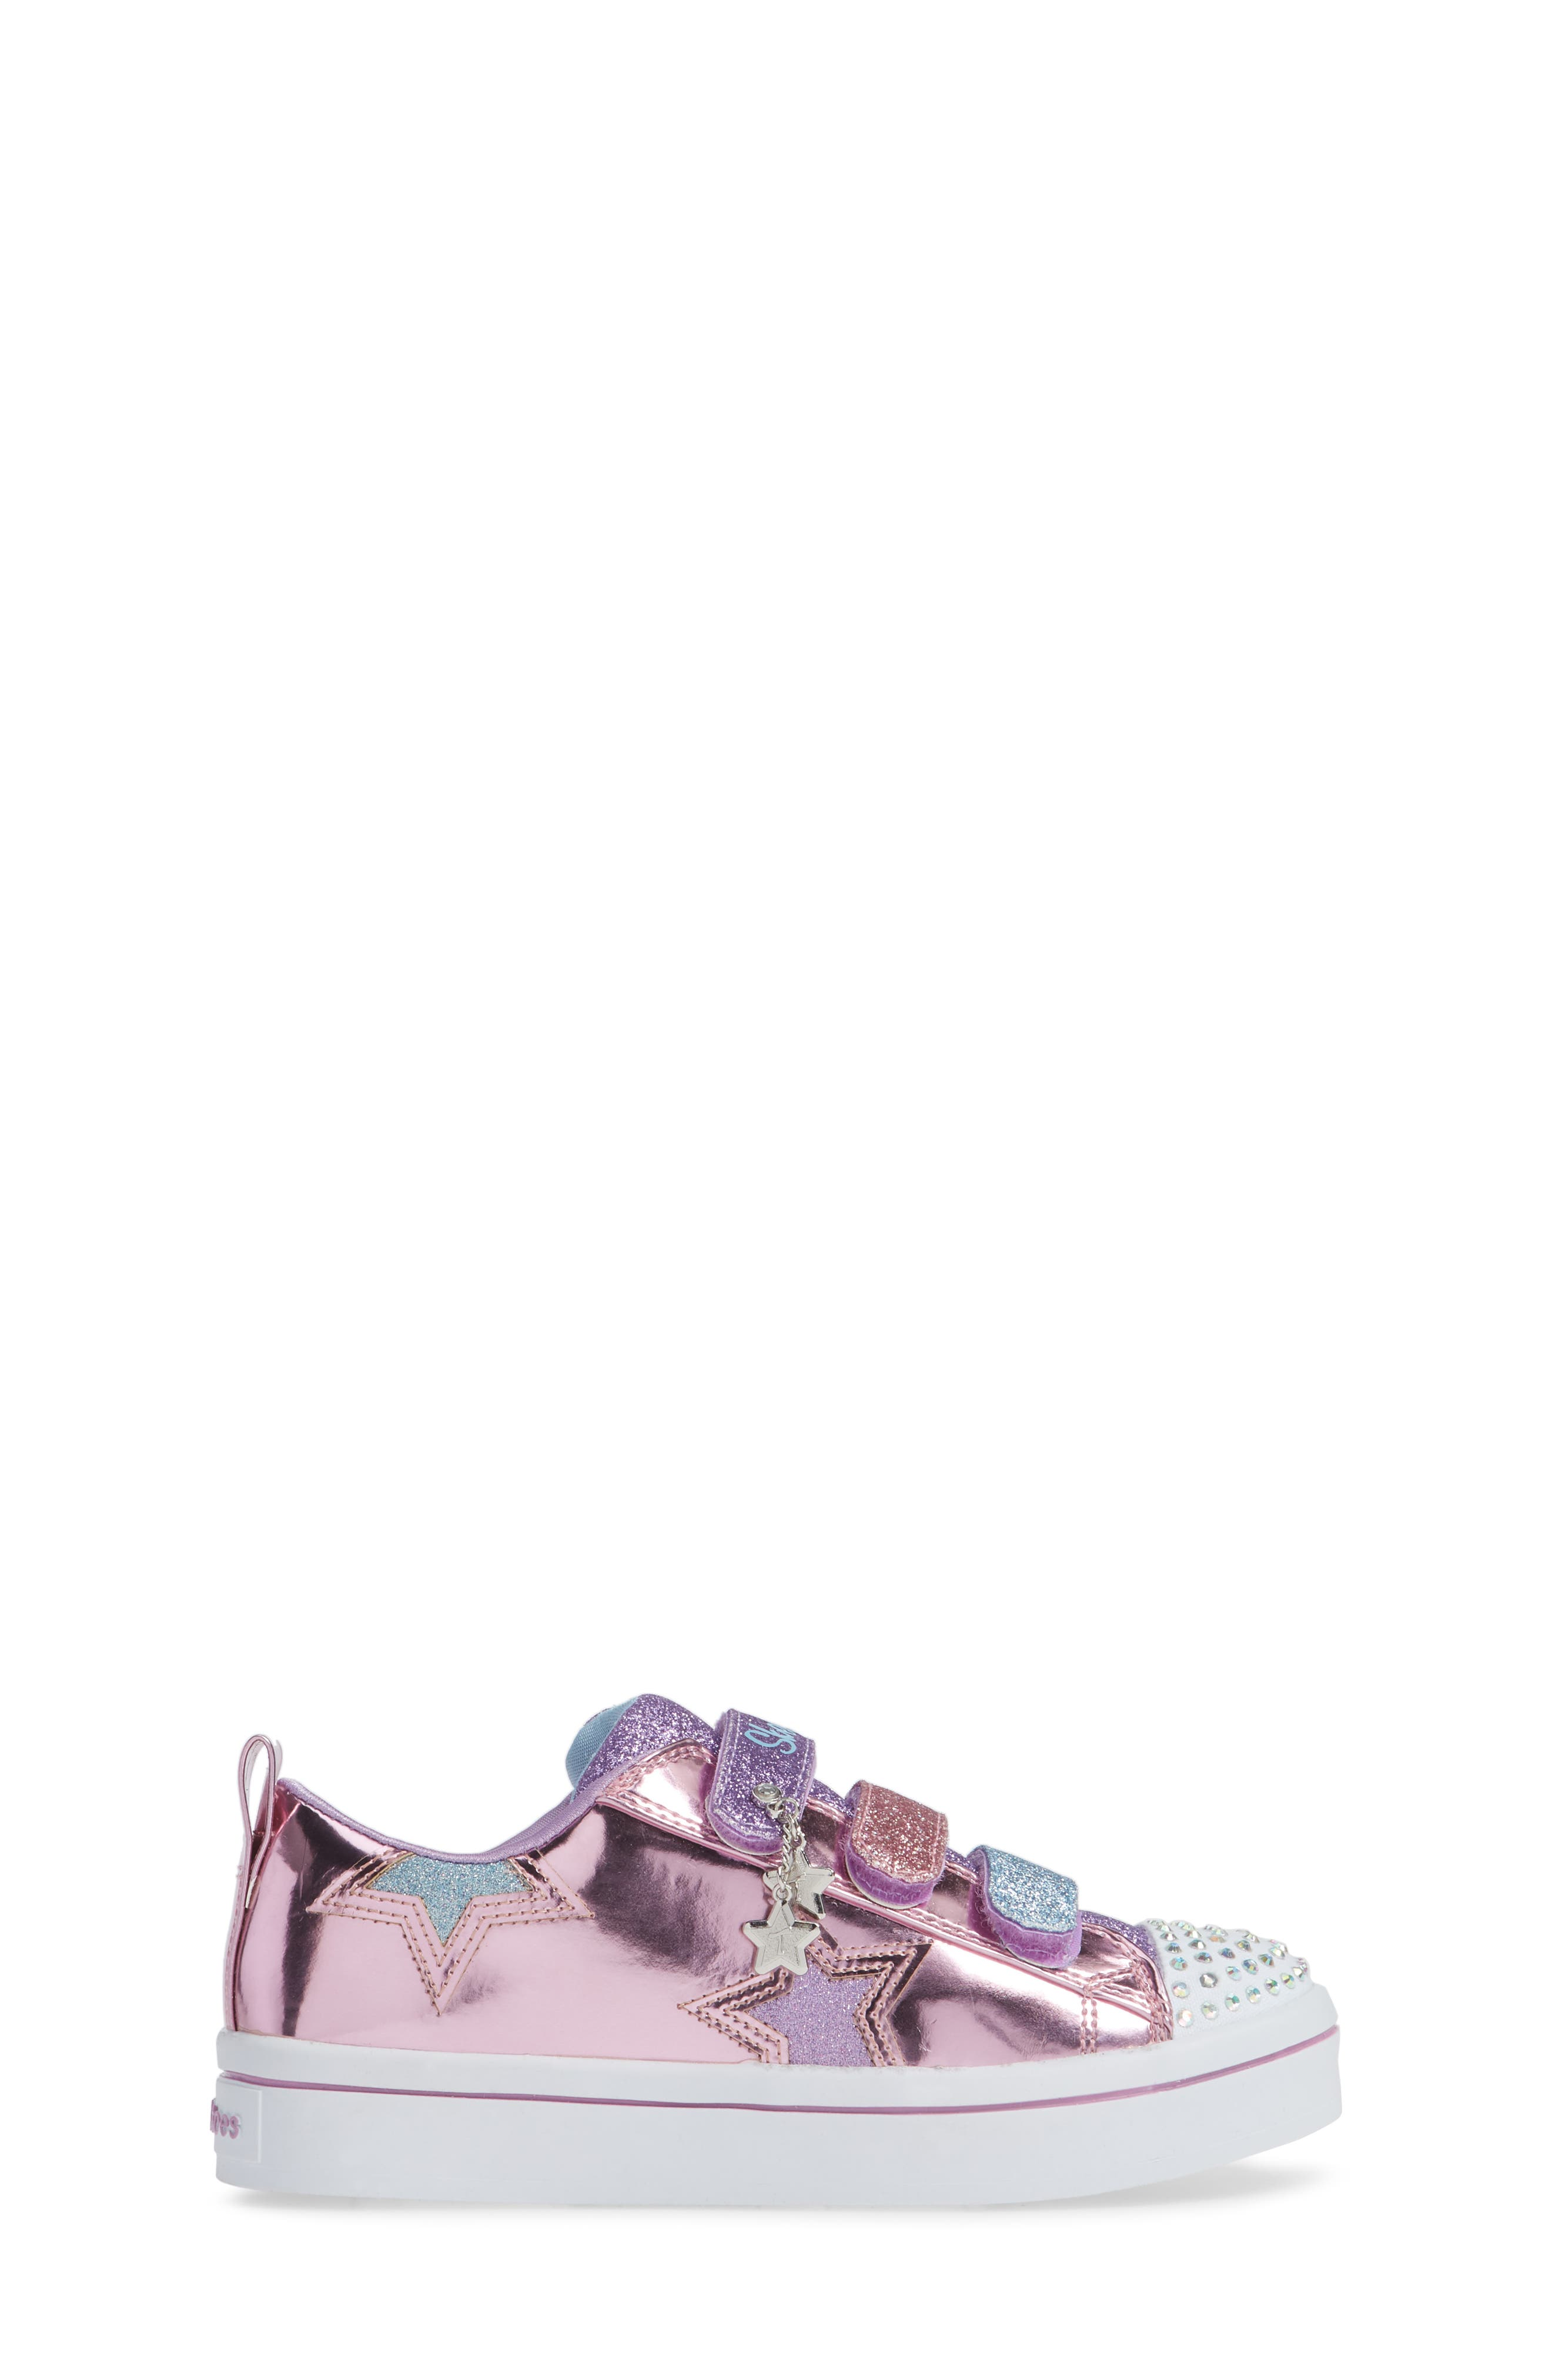 Twi-Lites Star Light-Up Sneaker,                             Alternate thumbnail 3, color,                             PINK/ MULTI